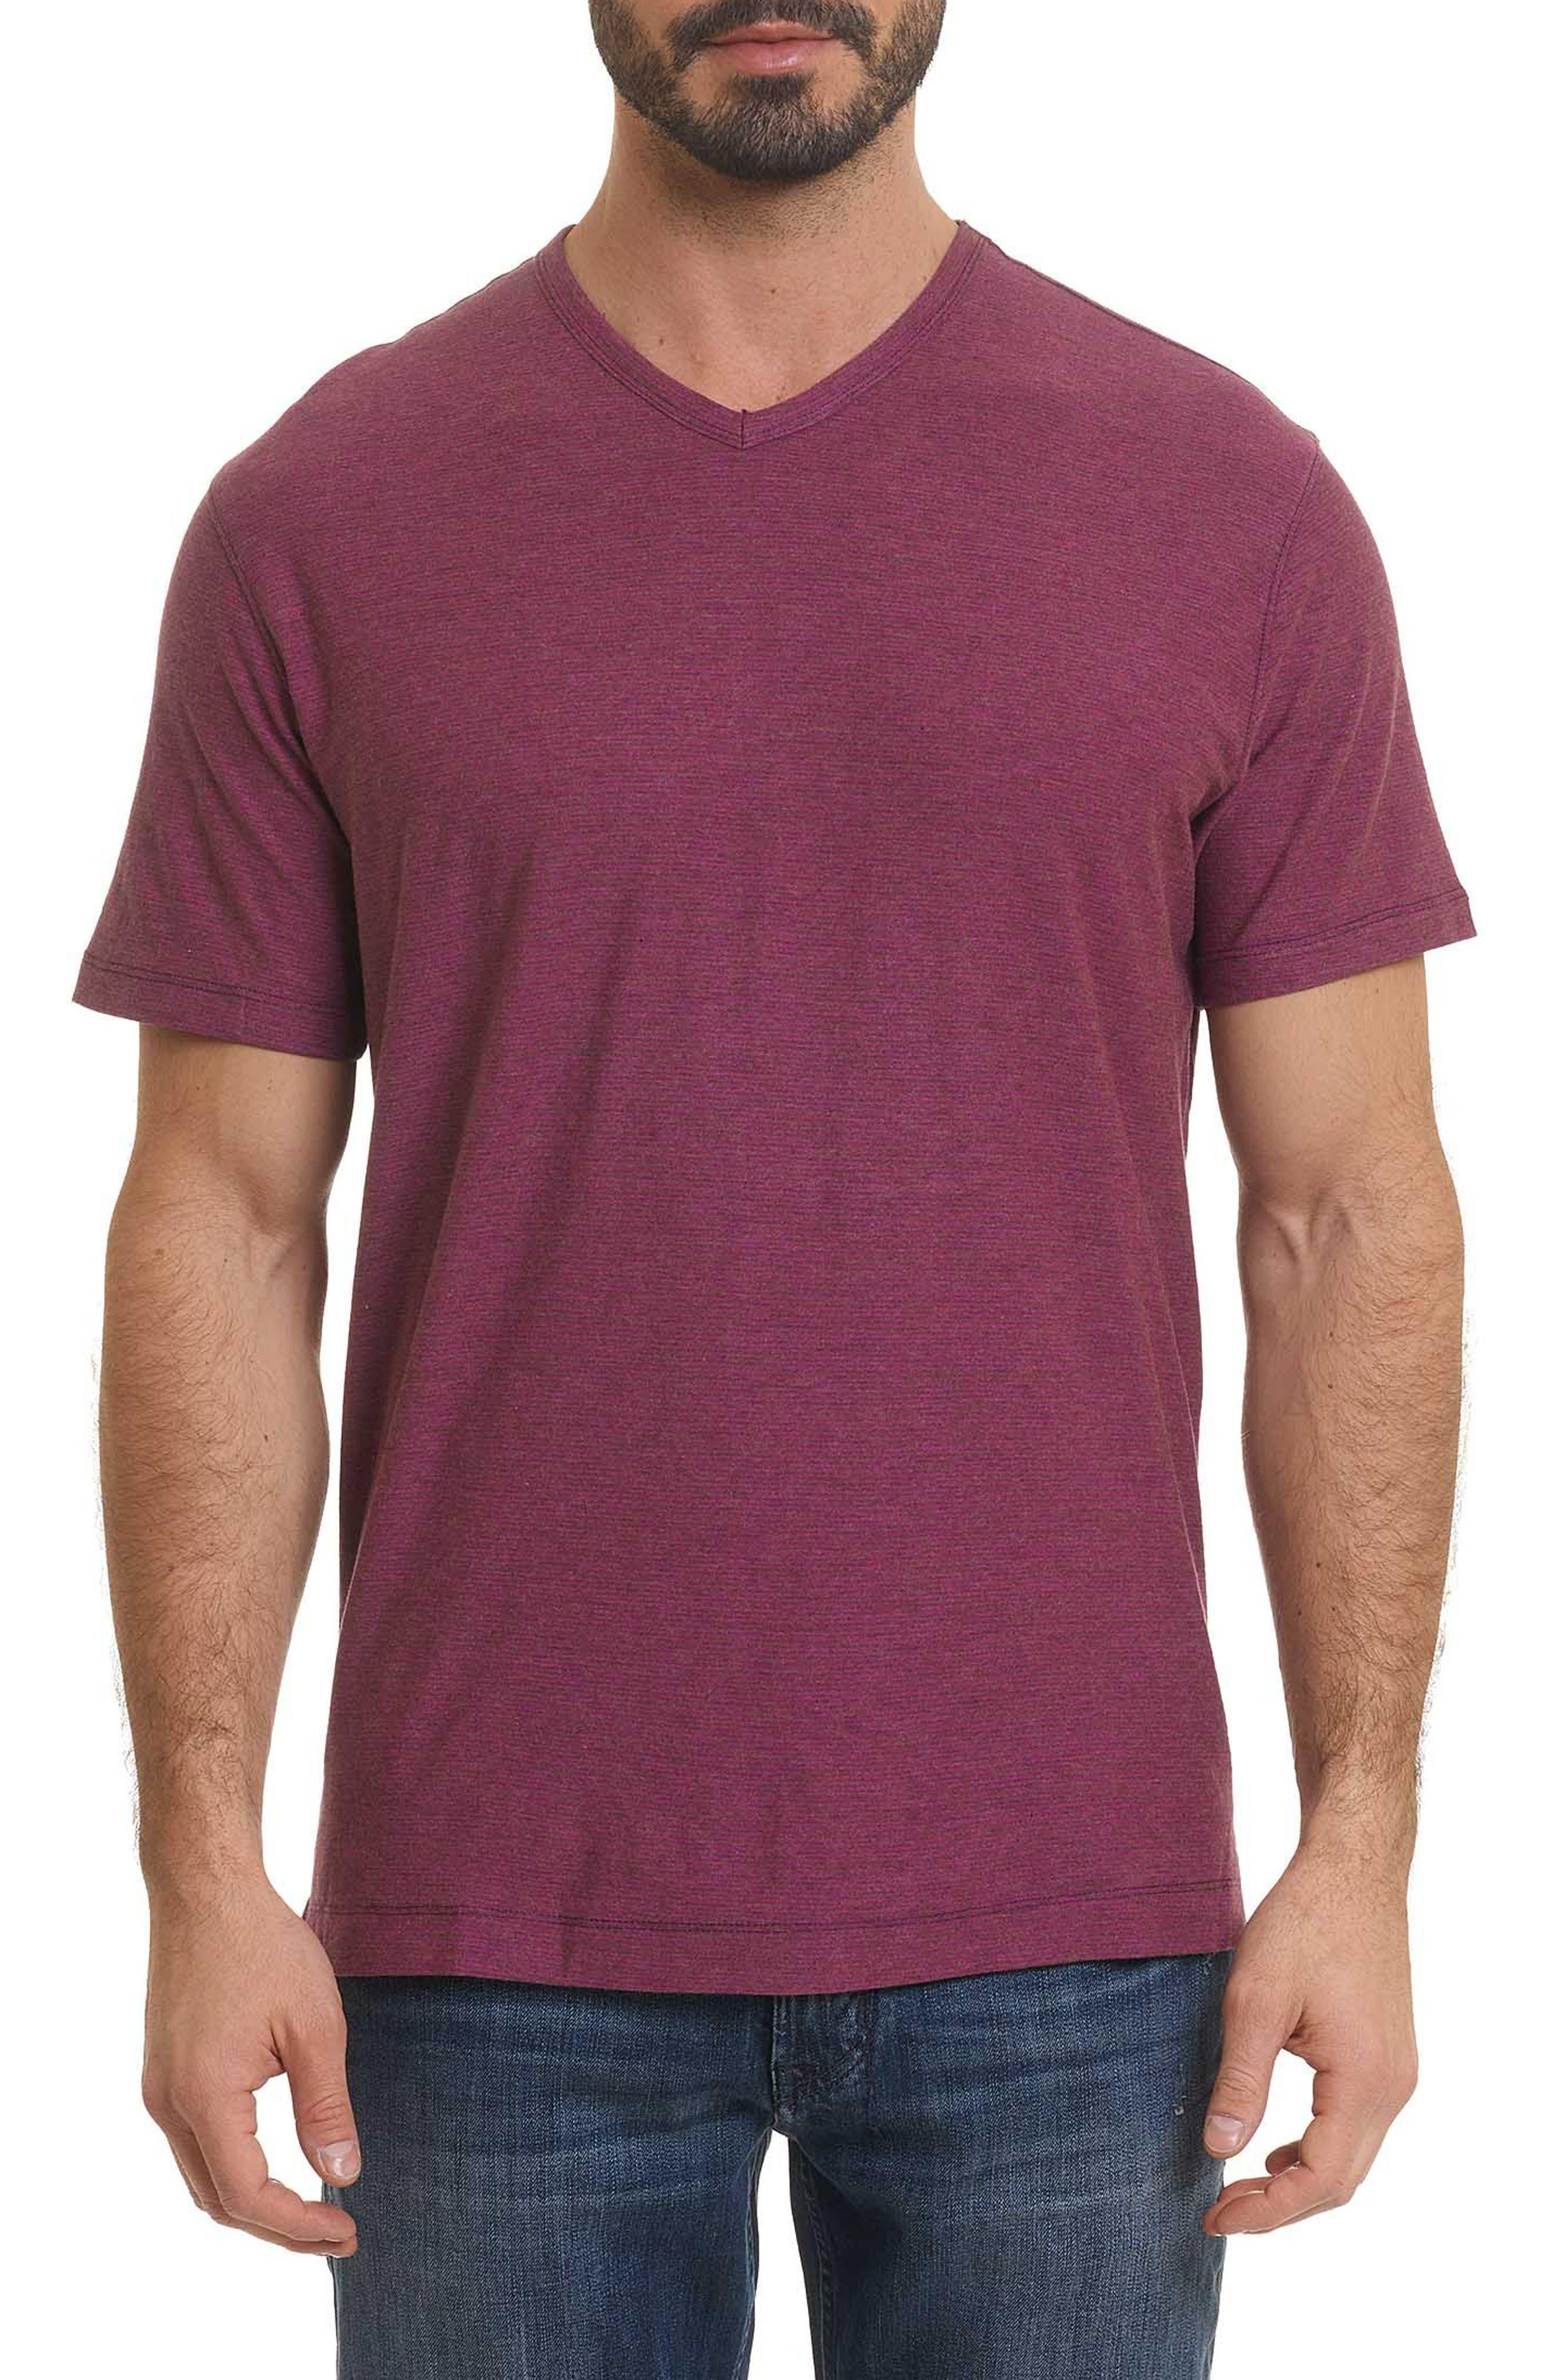 Orchidlands Stripe T-Shirt,                         Main,                         color, Heather Amethyst